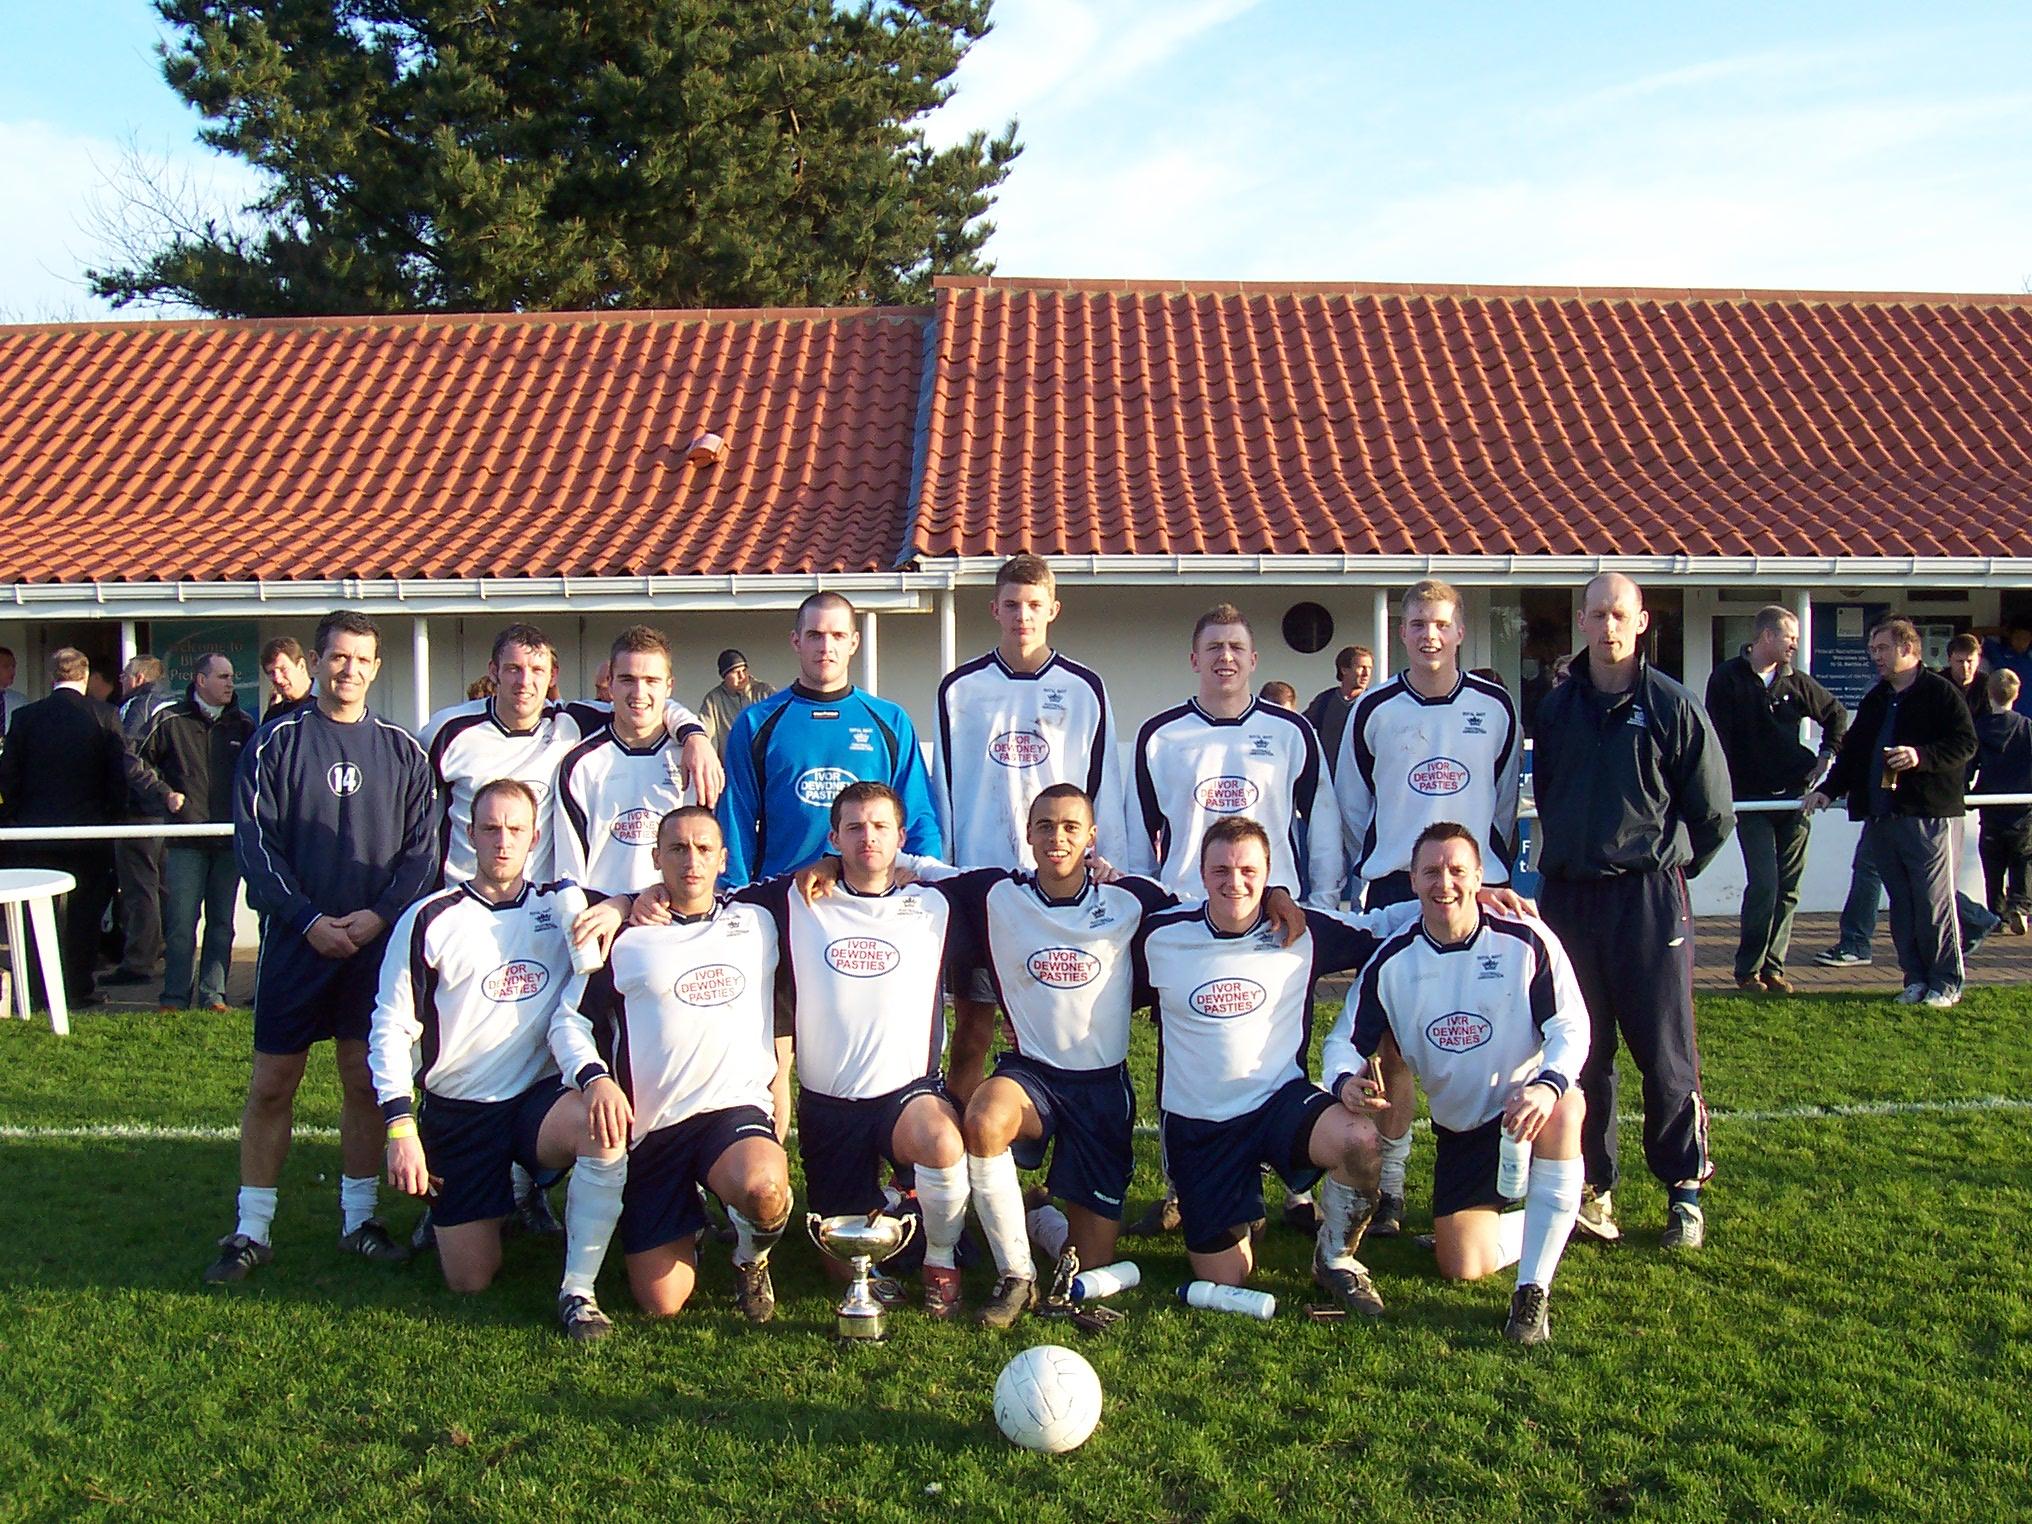 2007 Royal Navy FA Guernsey